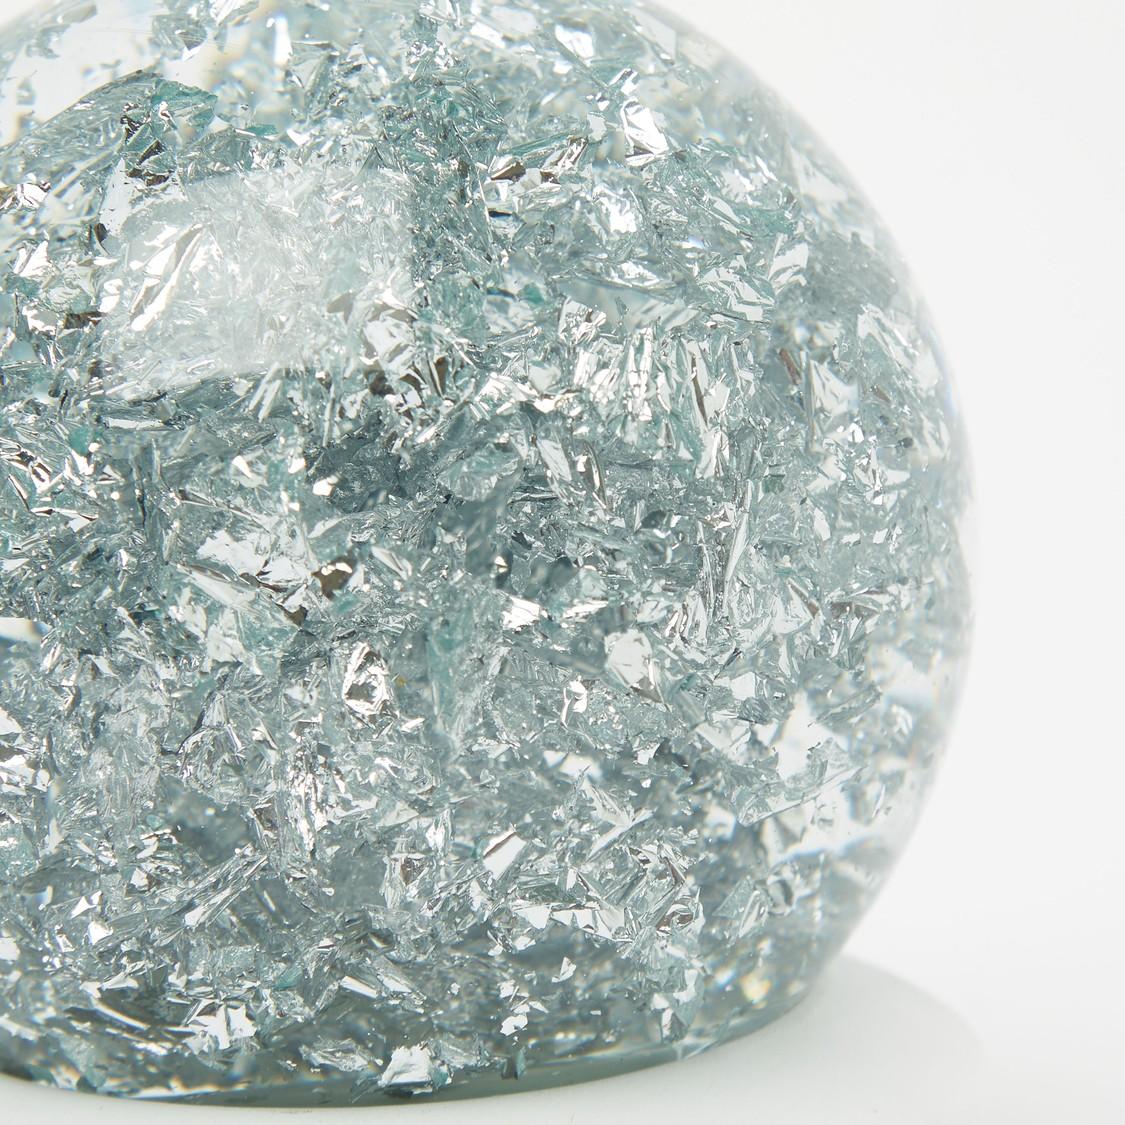 Decorative Water Ball